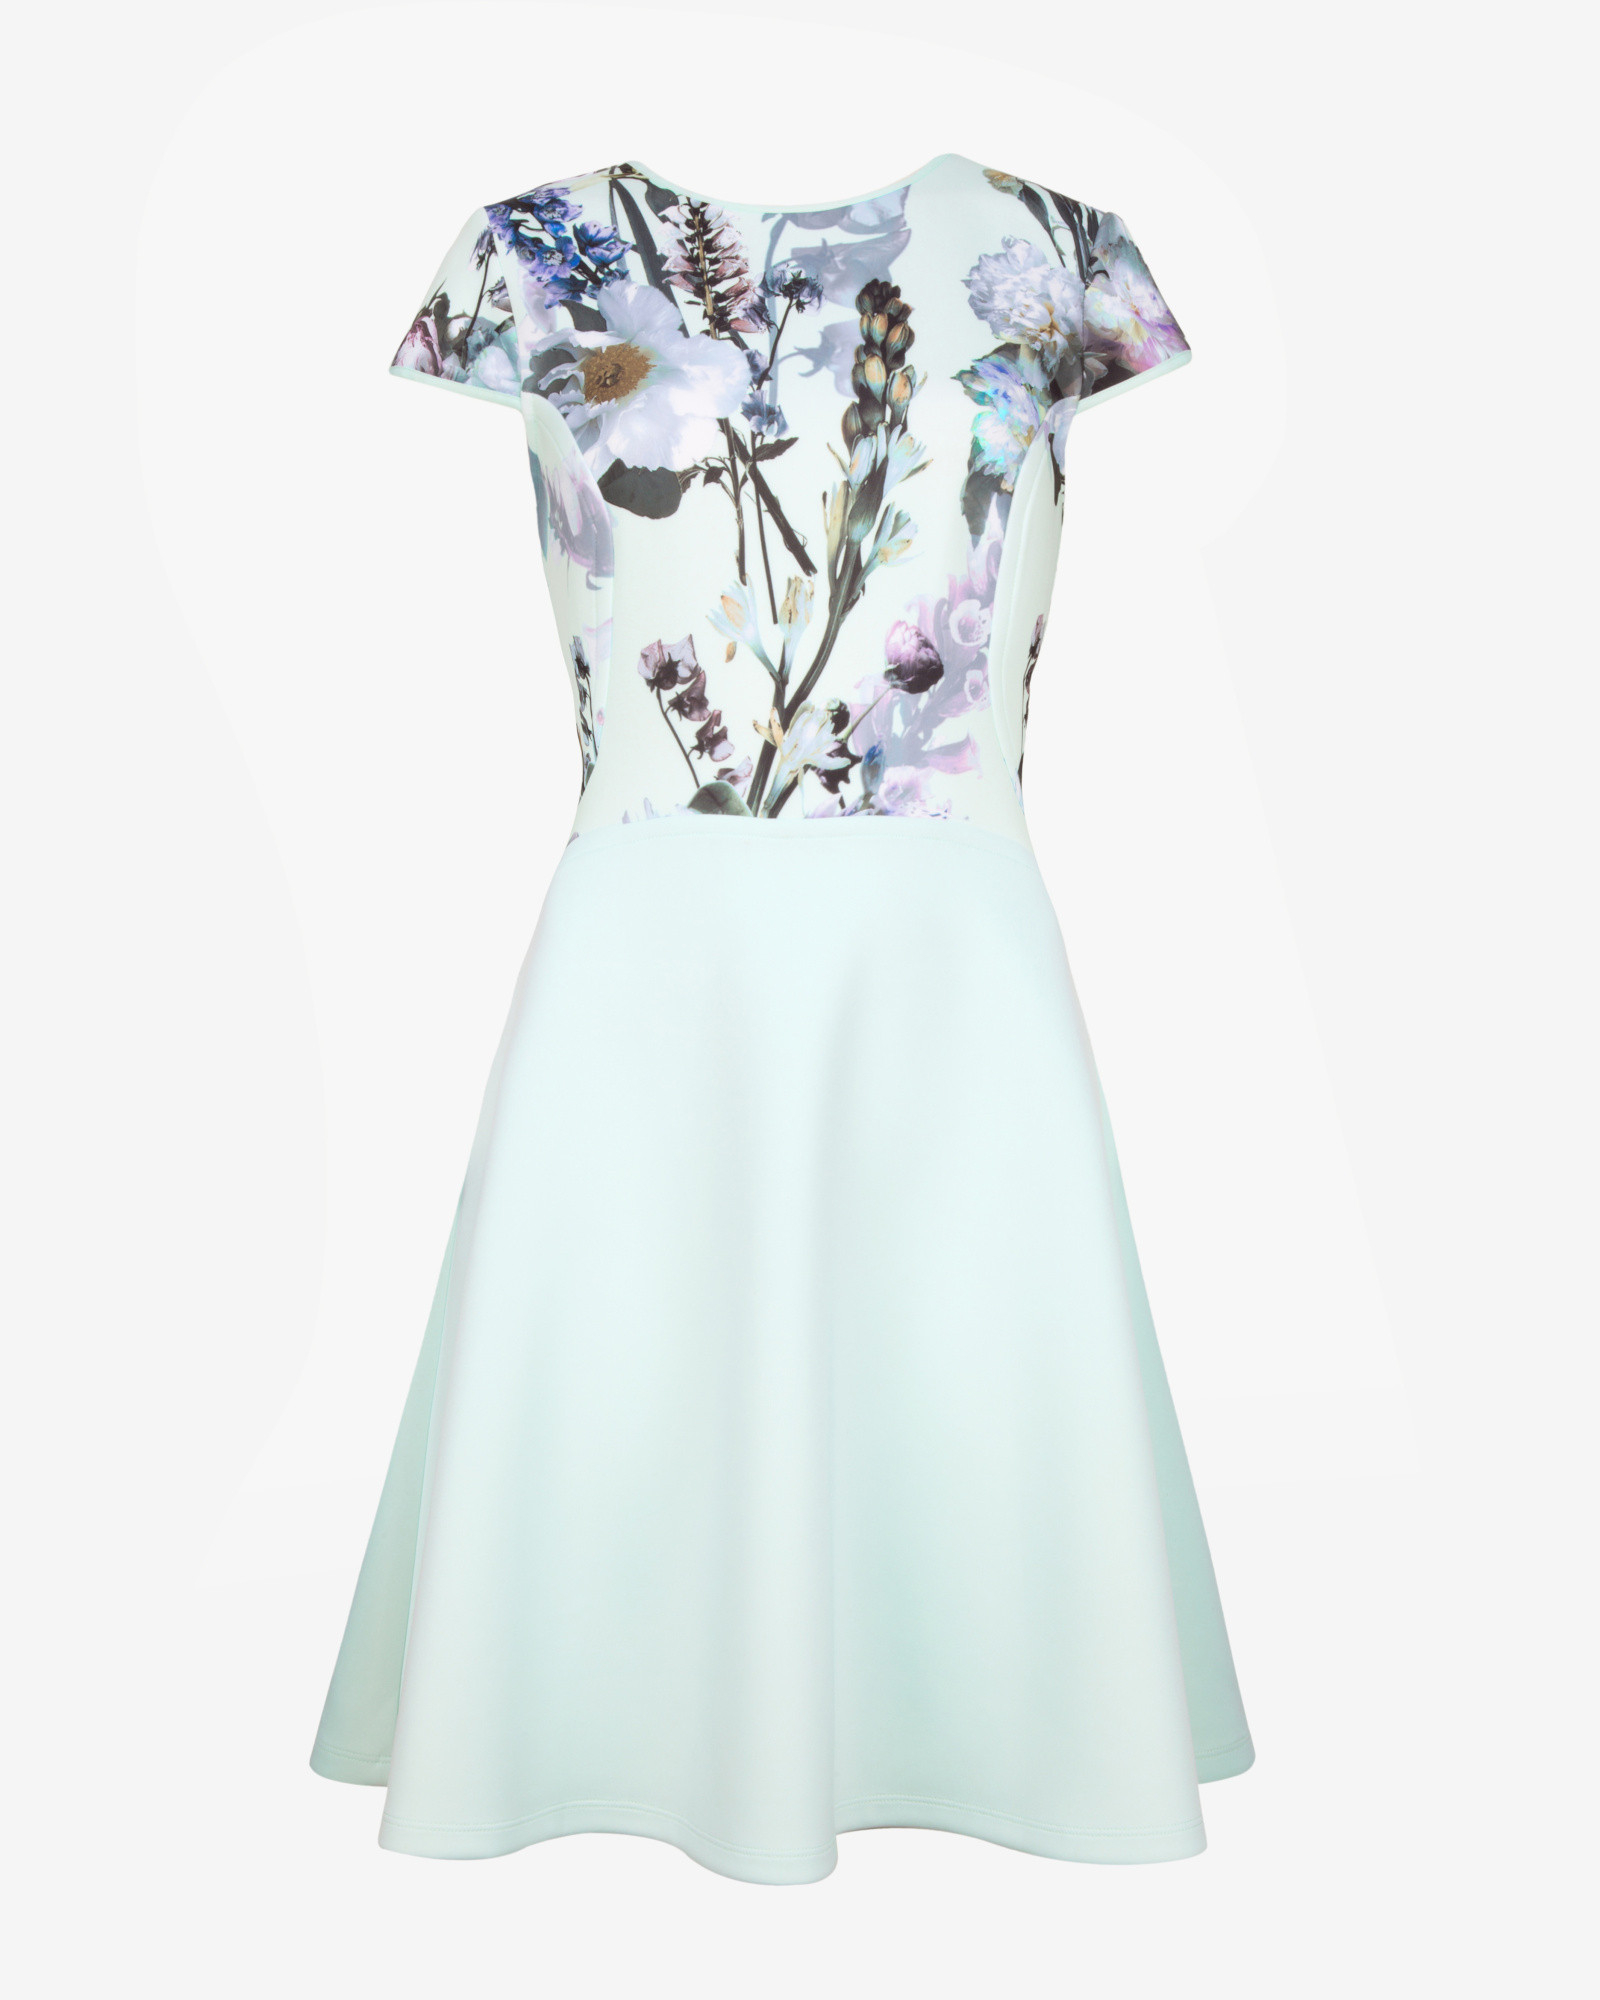 c689d2e23e Ted Baker Torchlit Floral Print Skater Dress in Blue - Lyst